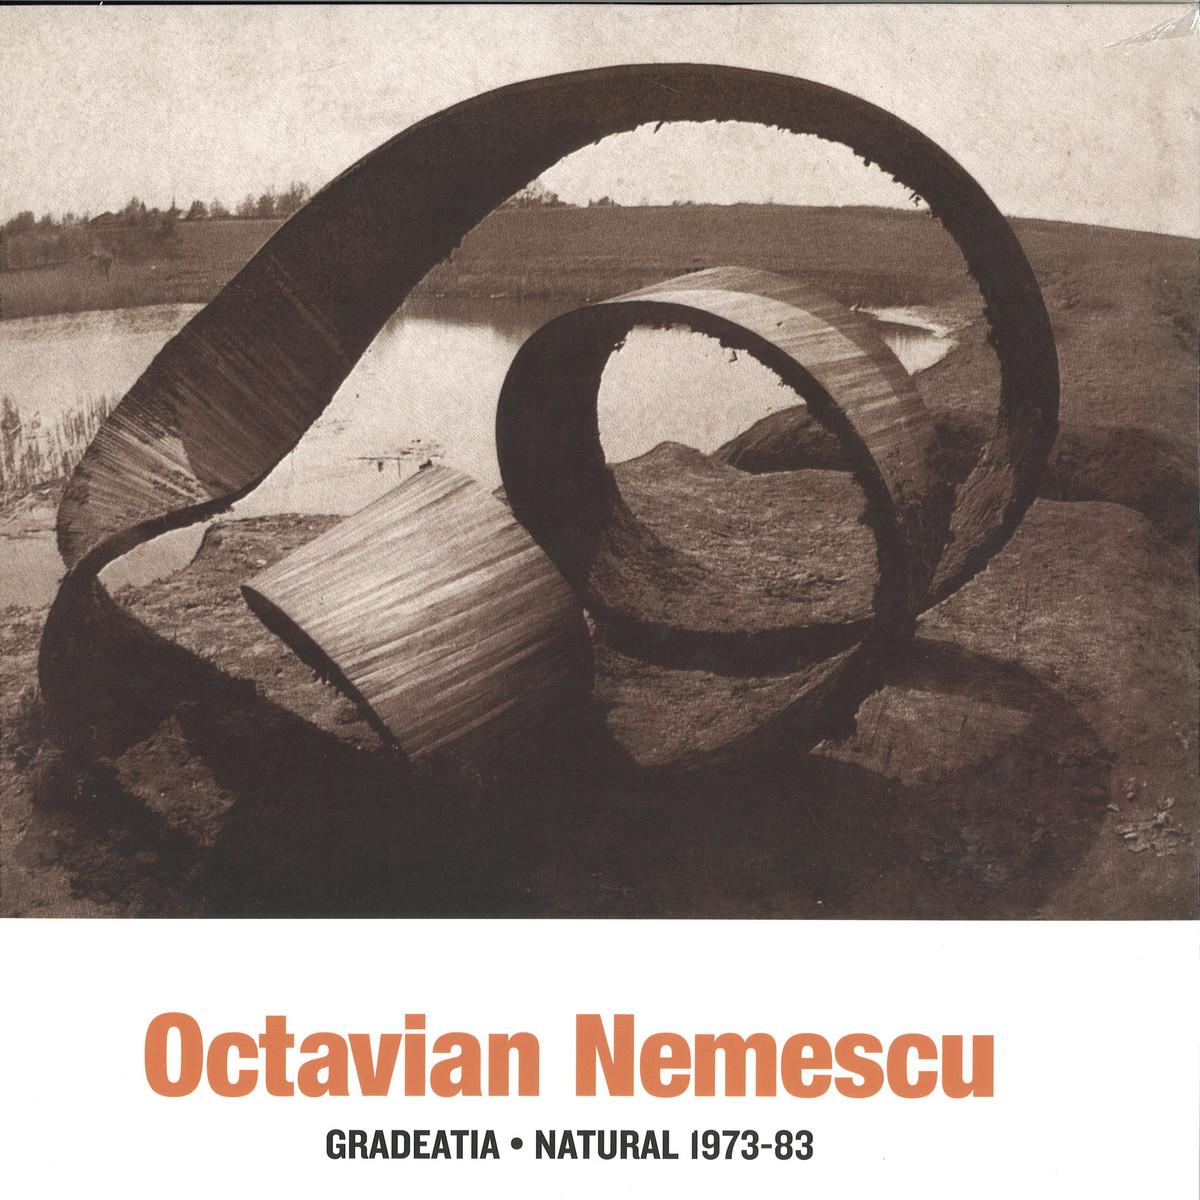 Octavian Nemescu Gradeatia / Natural: An Experimental Trip Into Romania's Electronic Music History